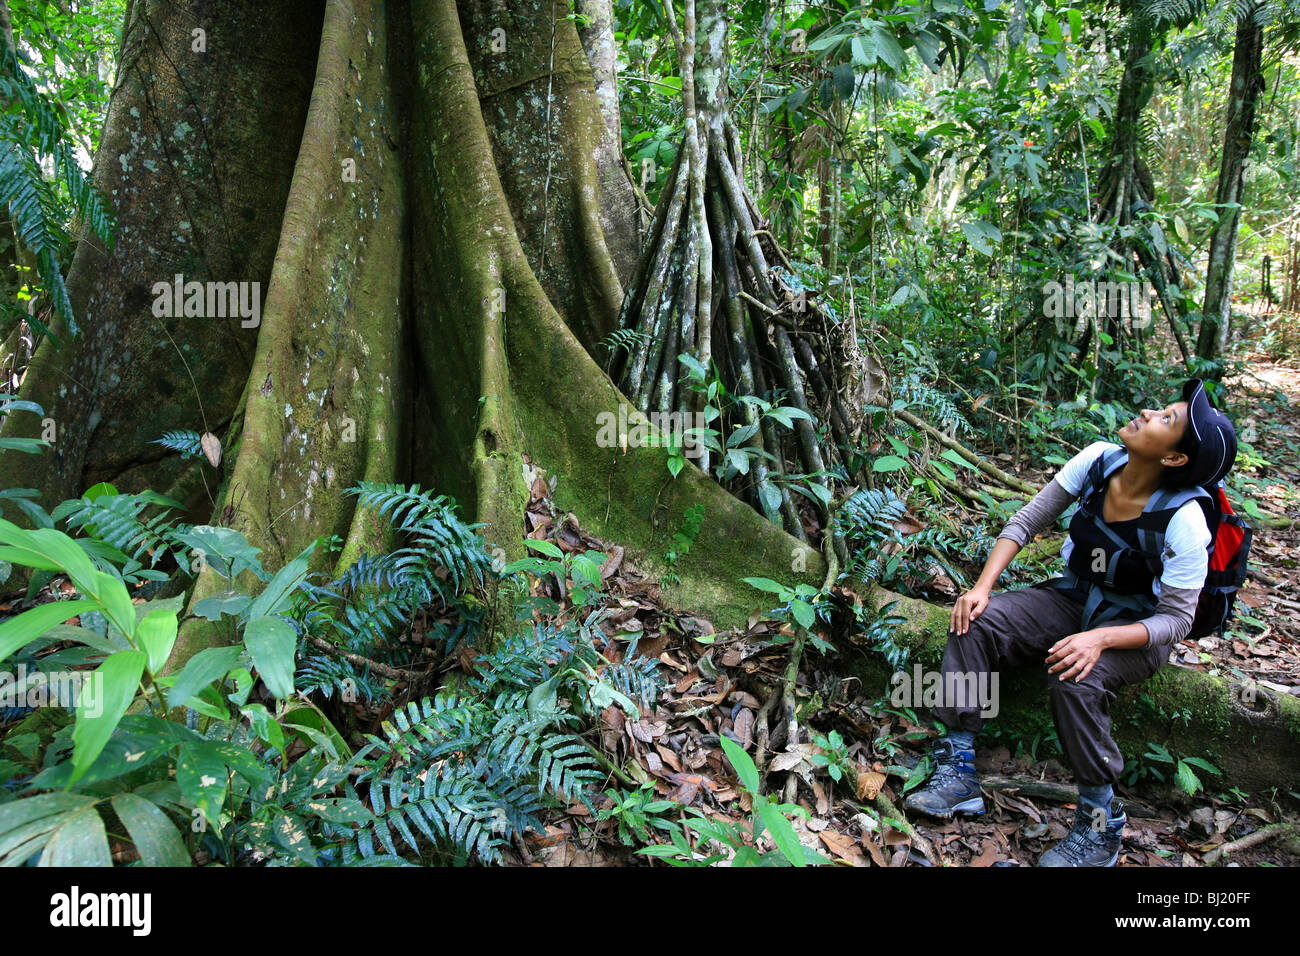 Girl and big ceiba tree at Cerro Pirre in the Darien national park, Darien province, Republic of Panama. Stock Photo